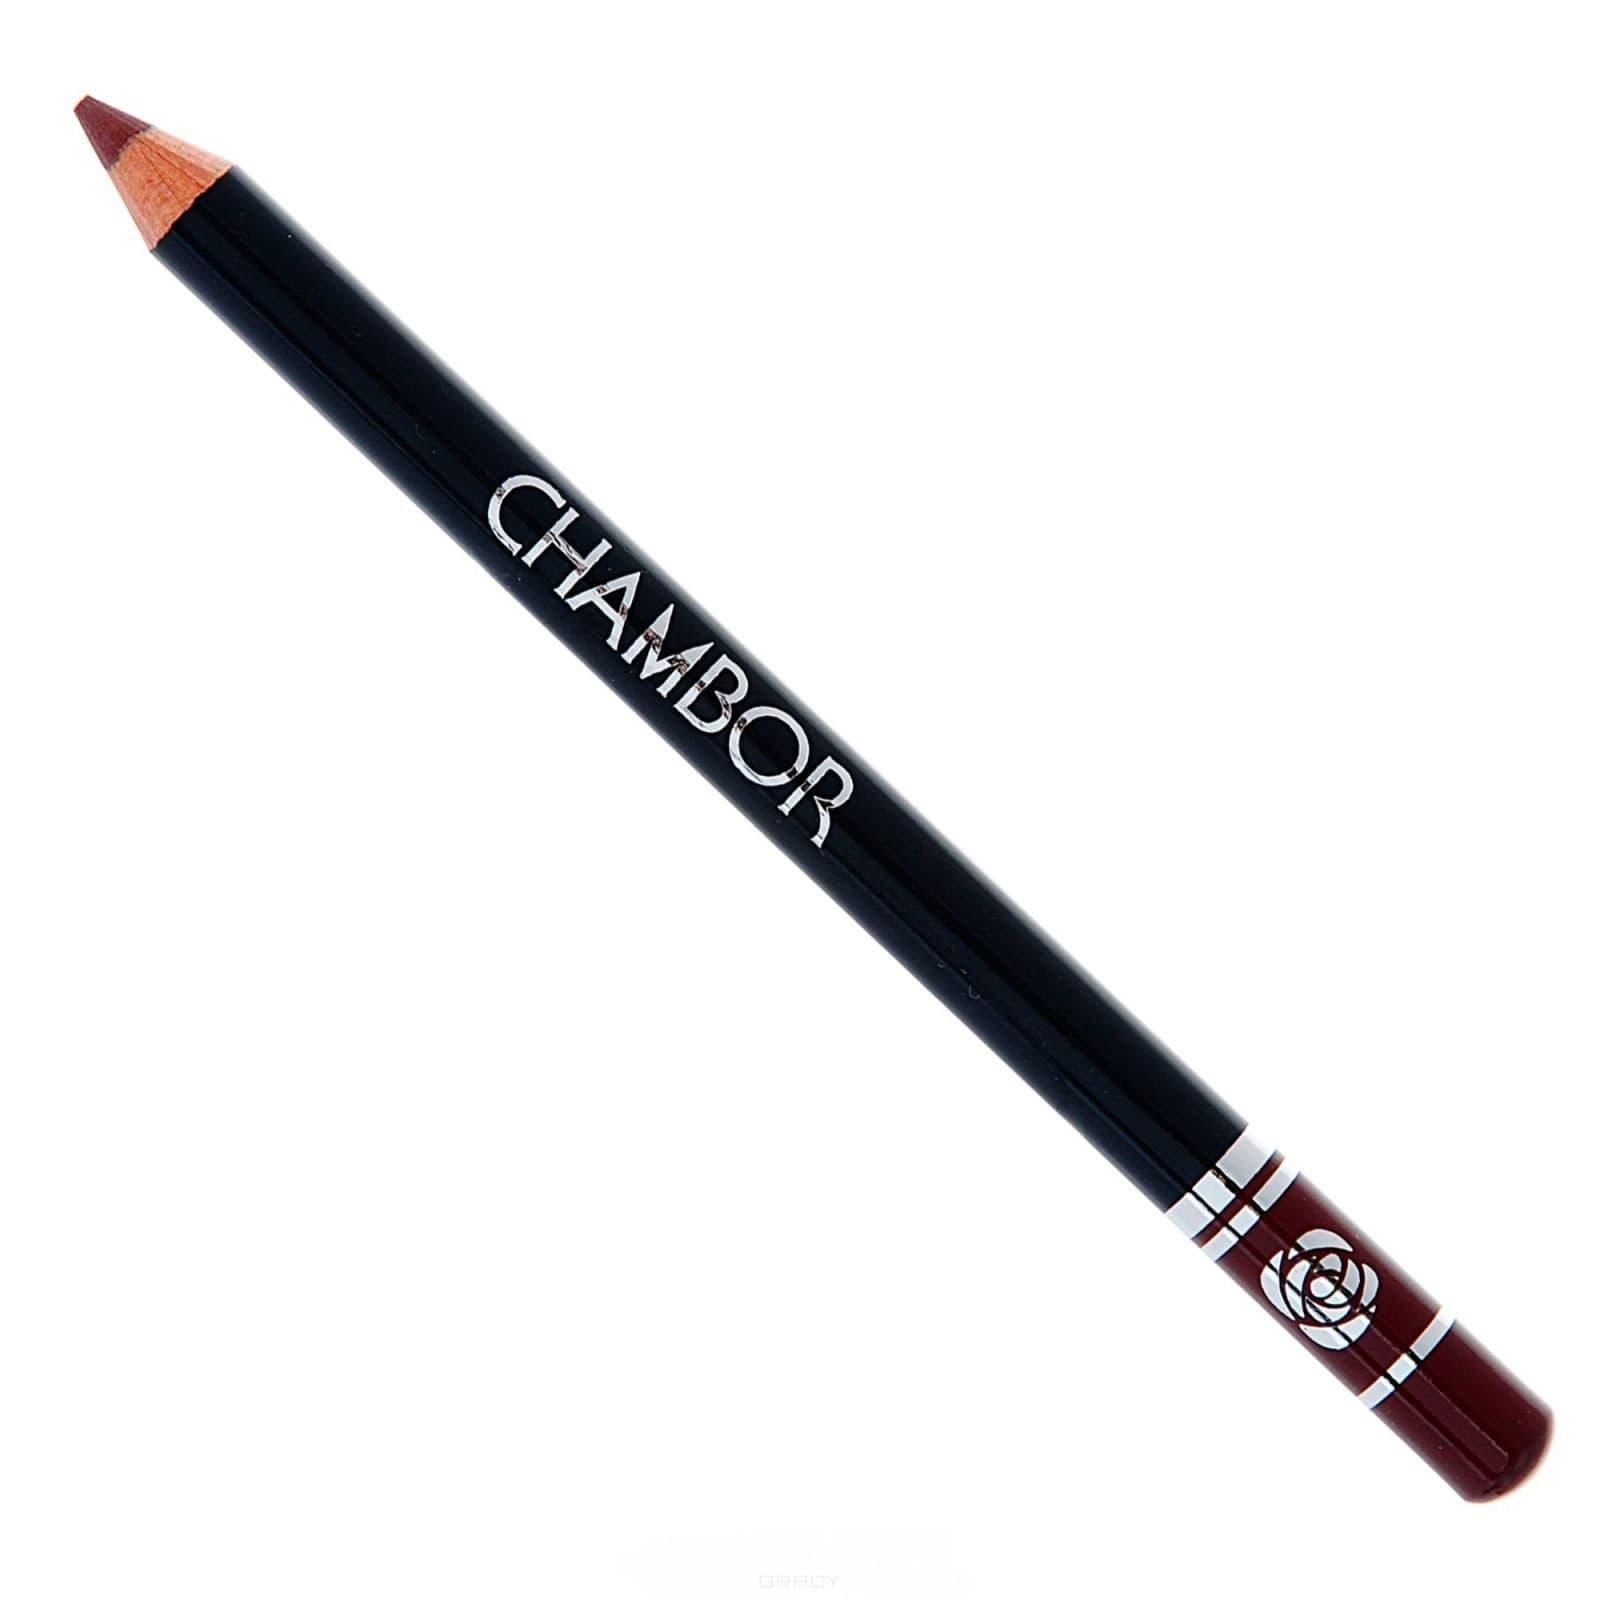 Chambor, Карандаш дл губ Lip Contour Pencil, 1,15 гр., maroon 1,15 гр. темно-красный кирпичныйДл губ<br><br>